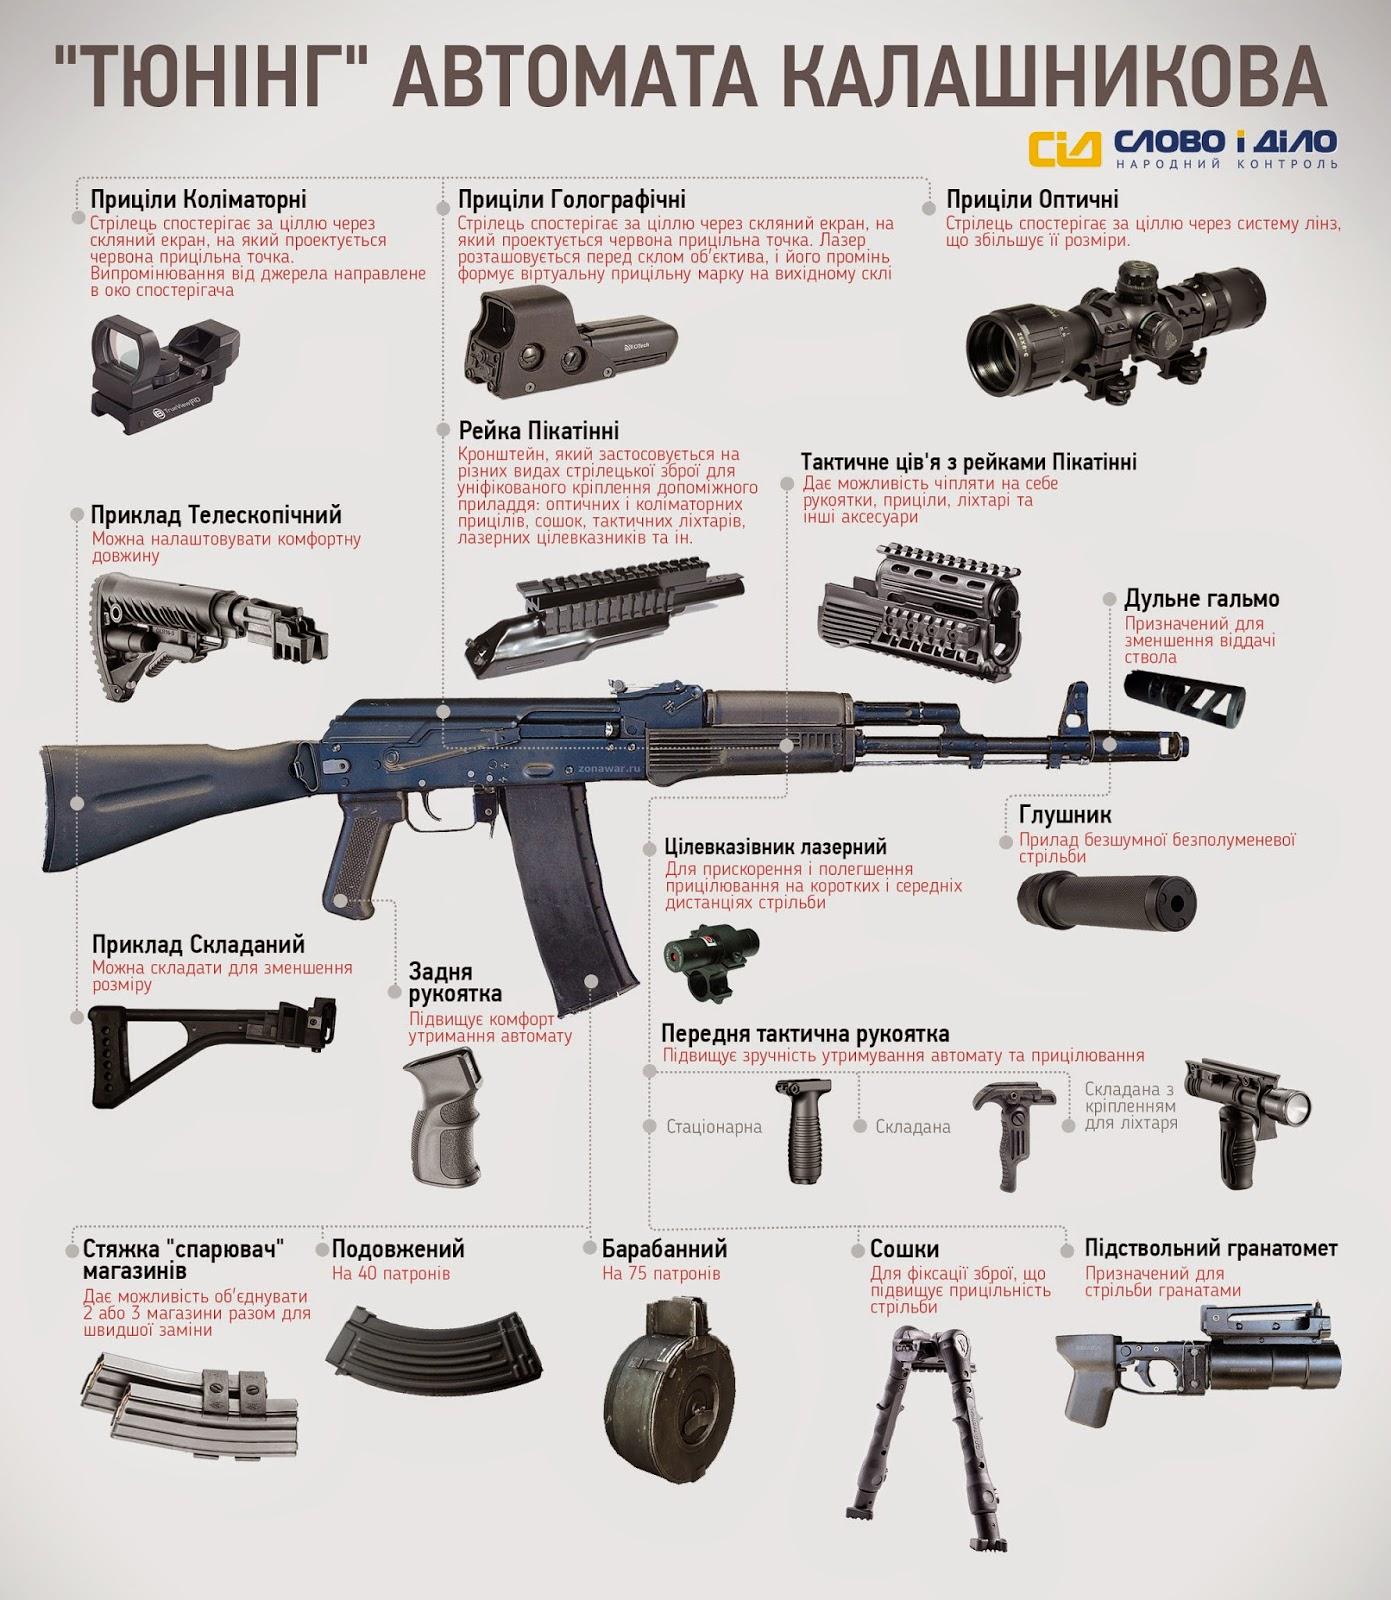 Тюнінг АК-74